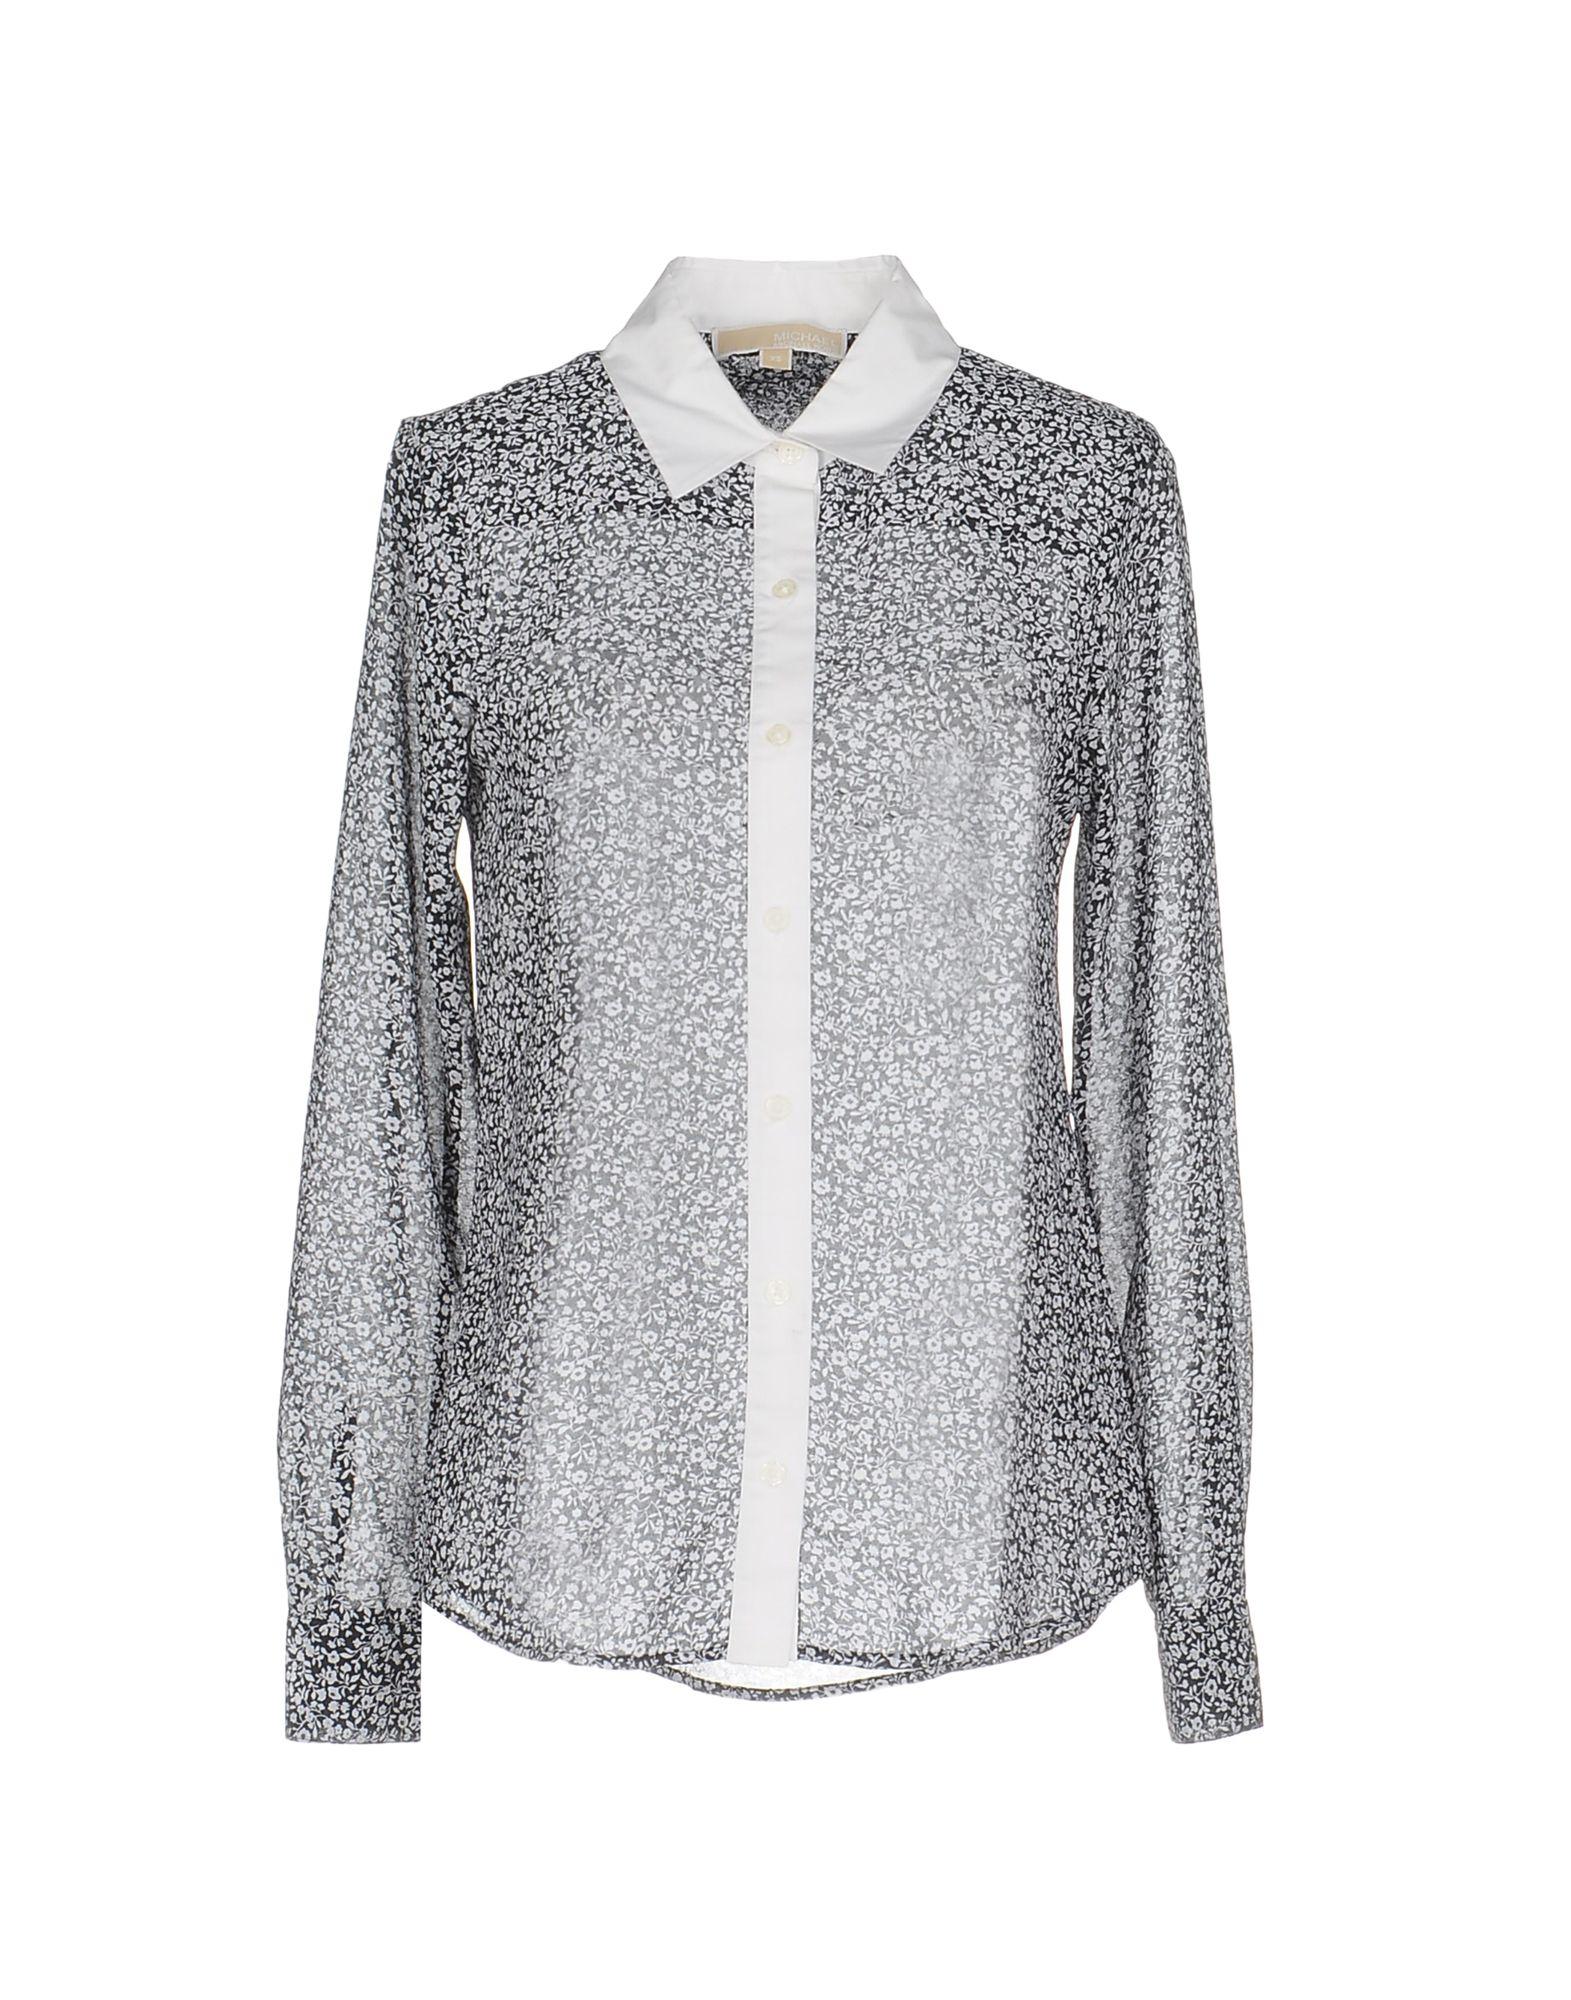 Michael Michael Kors Shirts